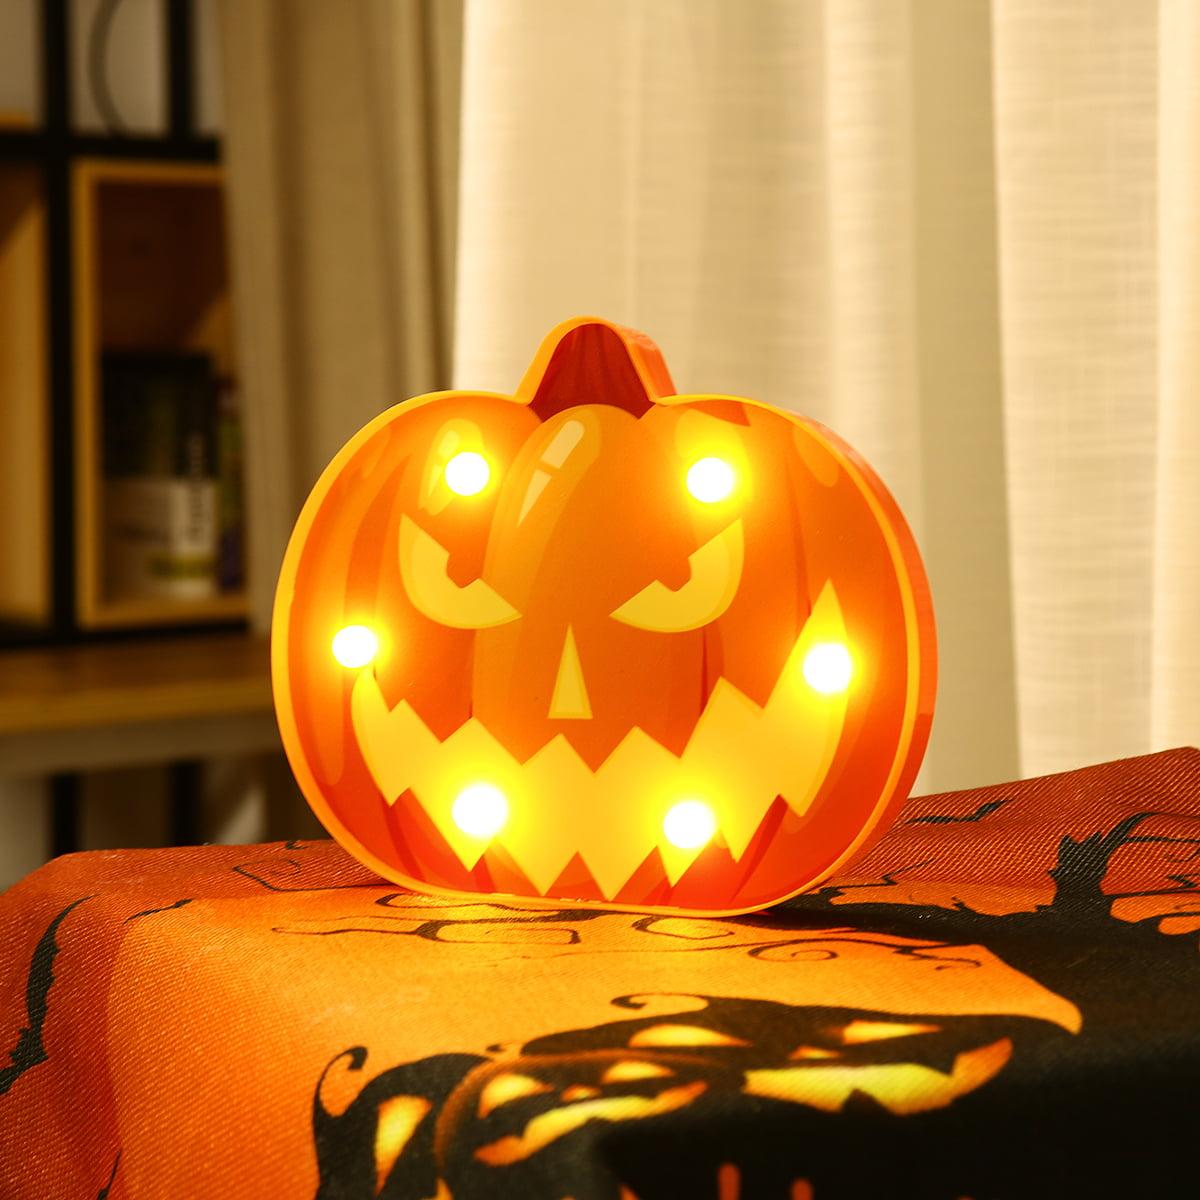 Small Pumpkin Skull LED String Light Halloween Home Decoration 12 Ct